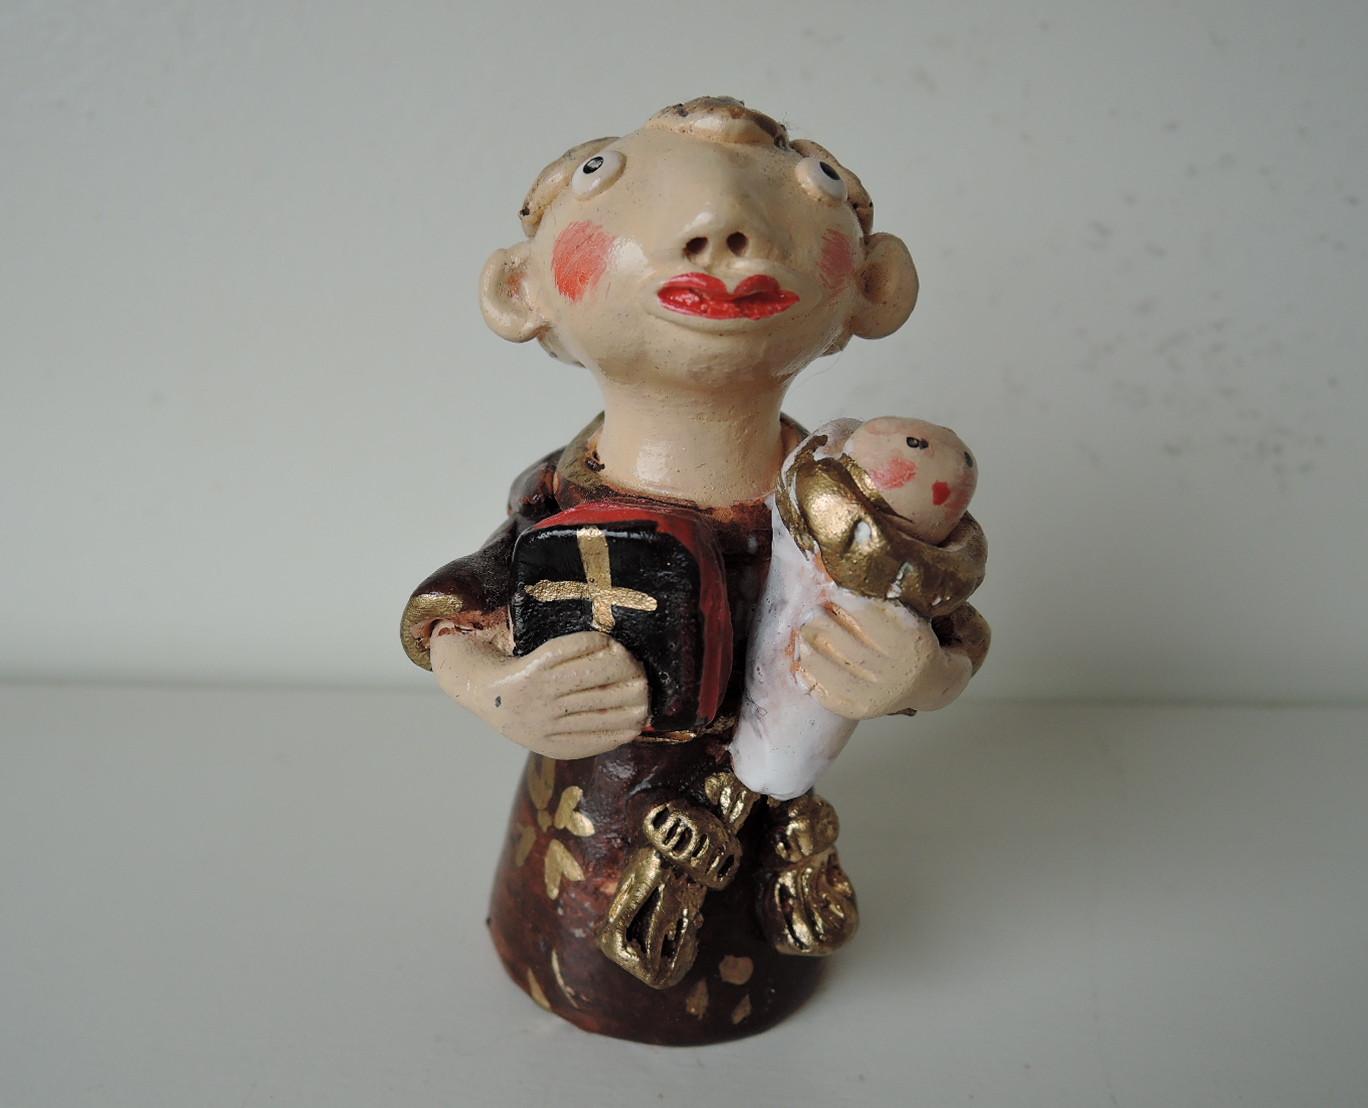 irene Saigueiro さんの聖人